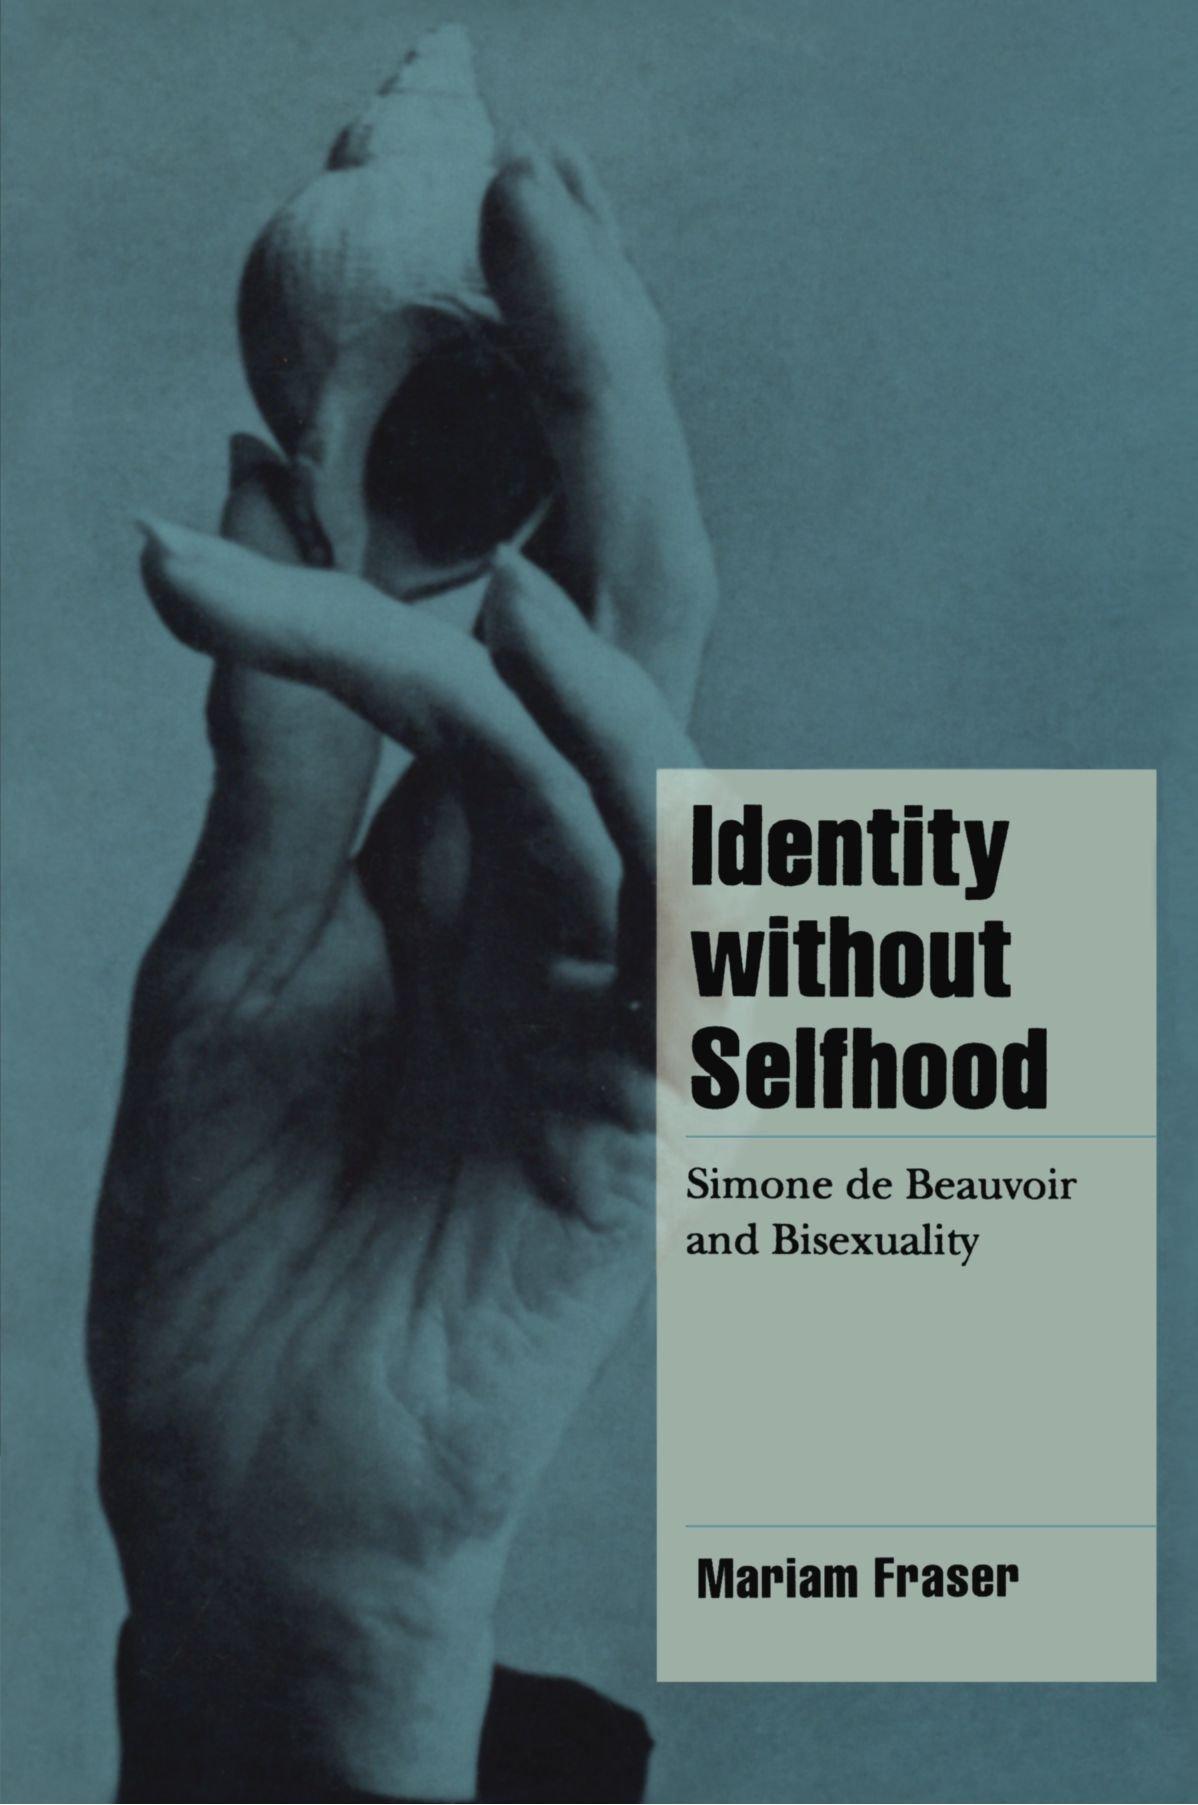 Amazon.com: Identity without Selfhood: Simone de Beauvoir and ...